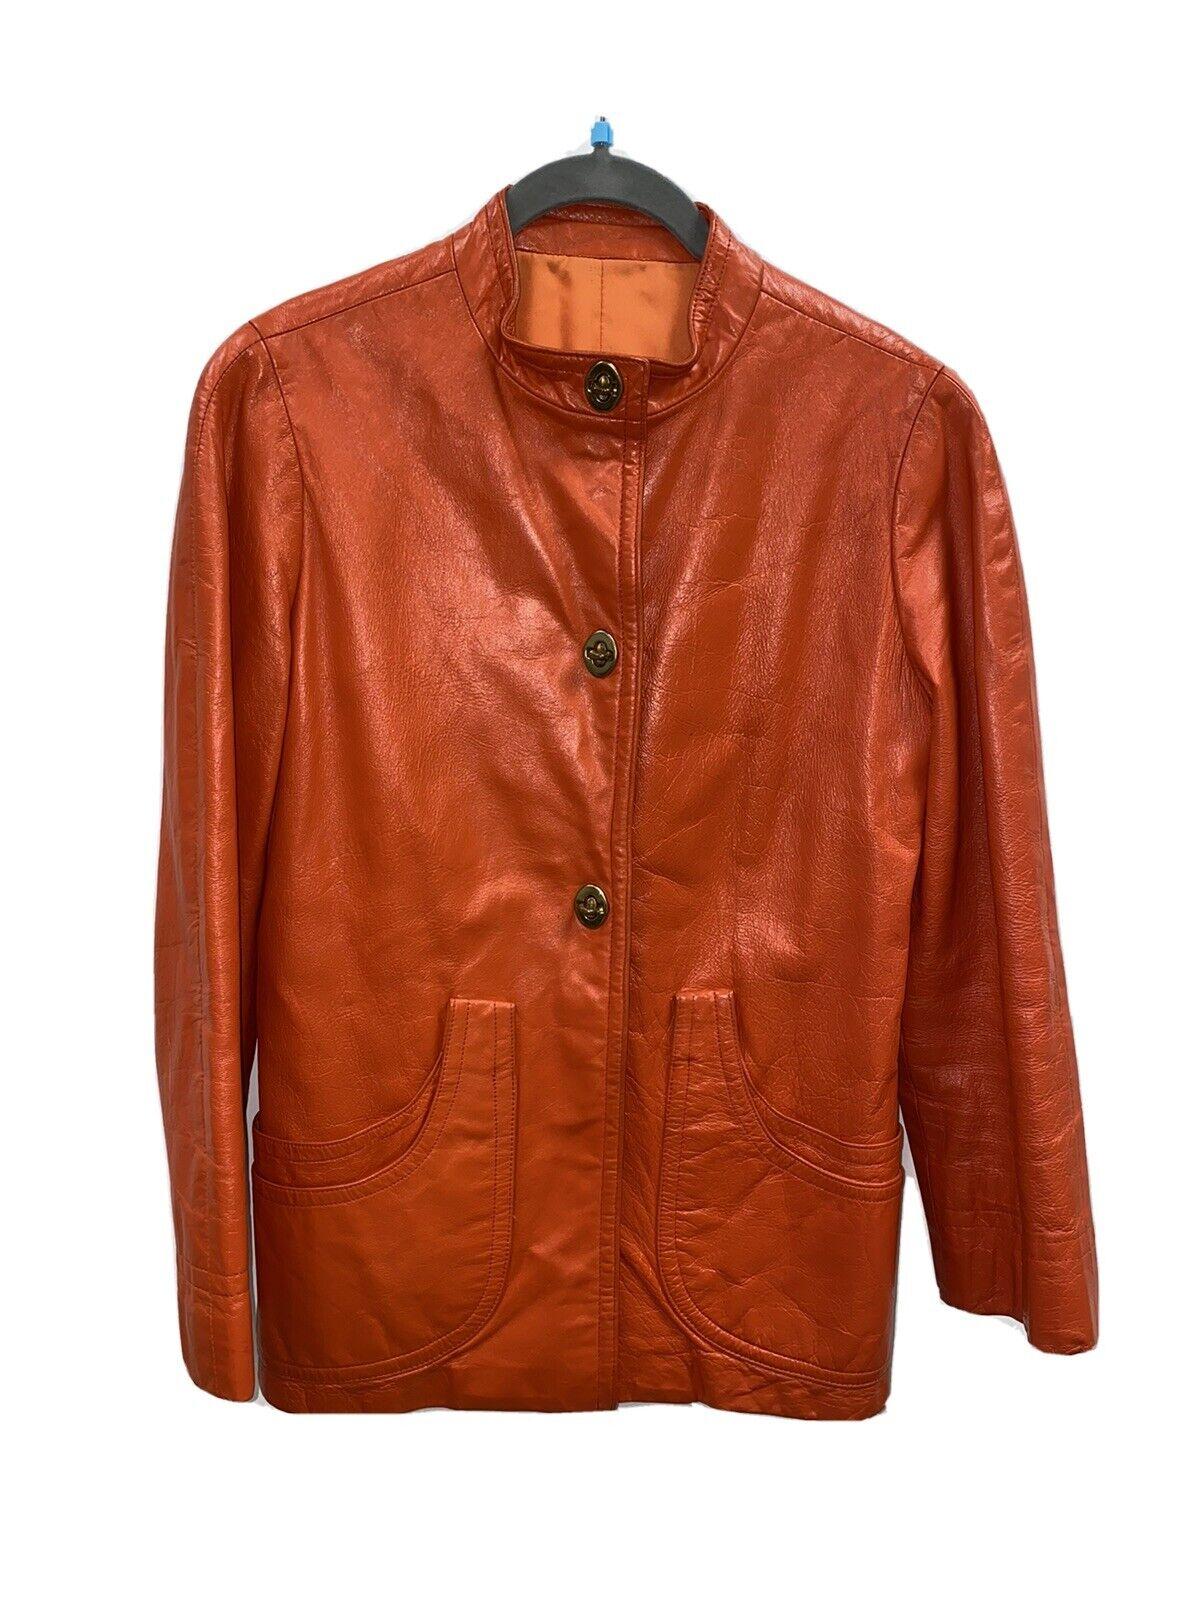 Bonnie Cashin Sills Orange Leather 1960s Mod Wais… - image 1